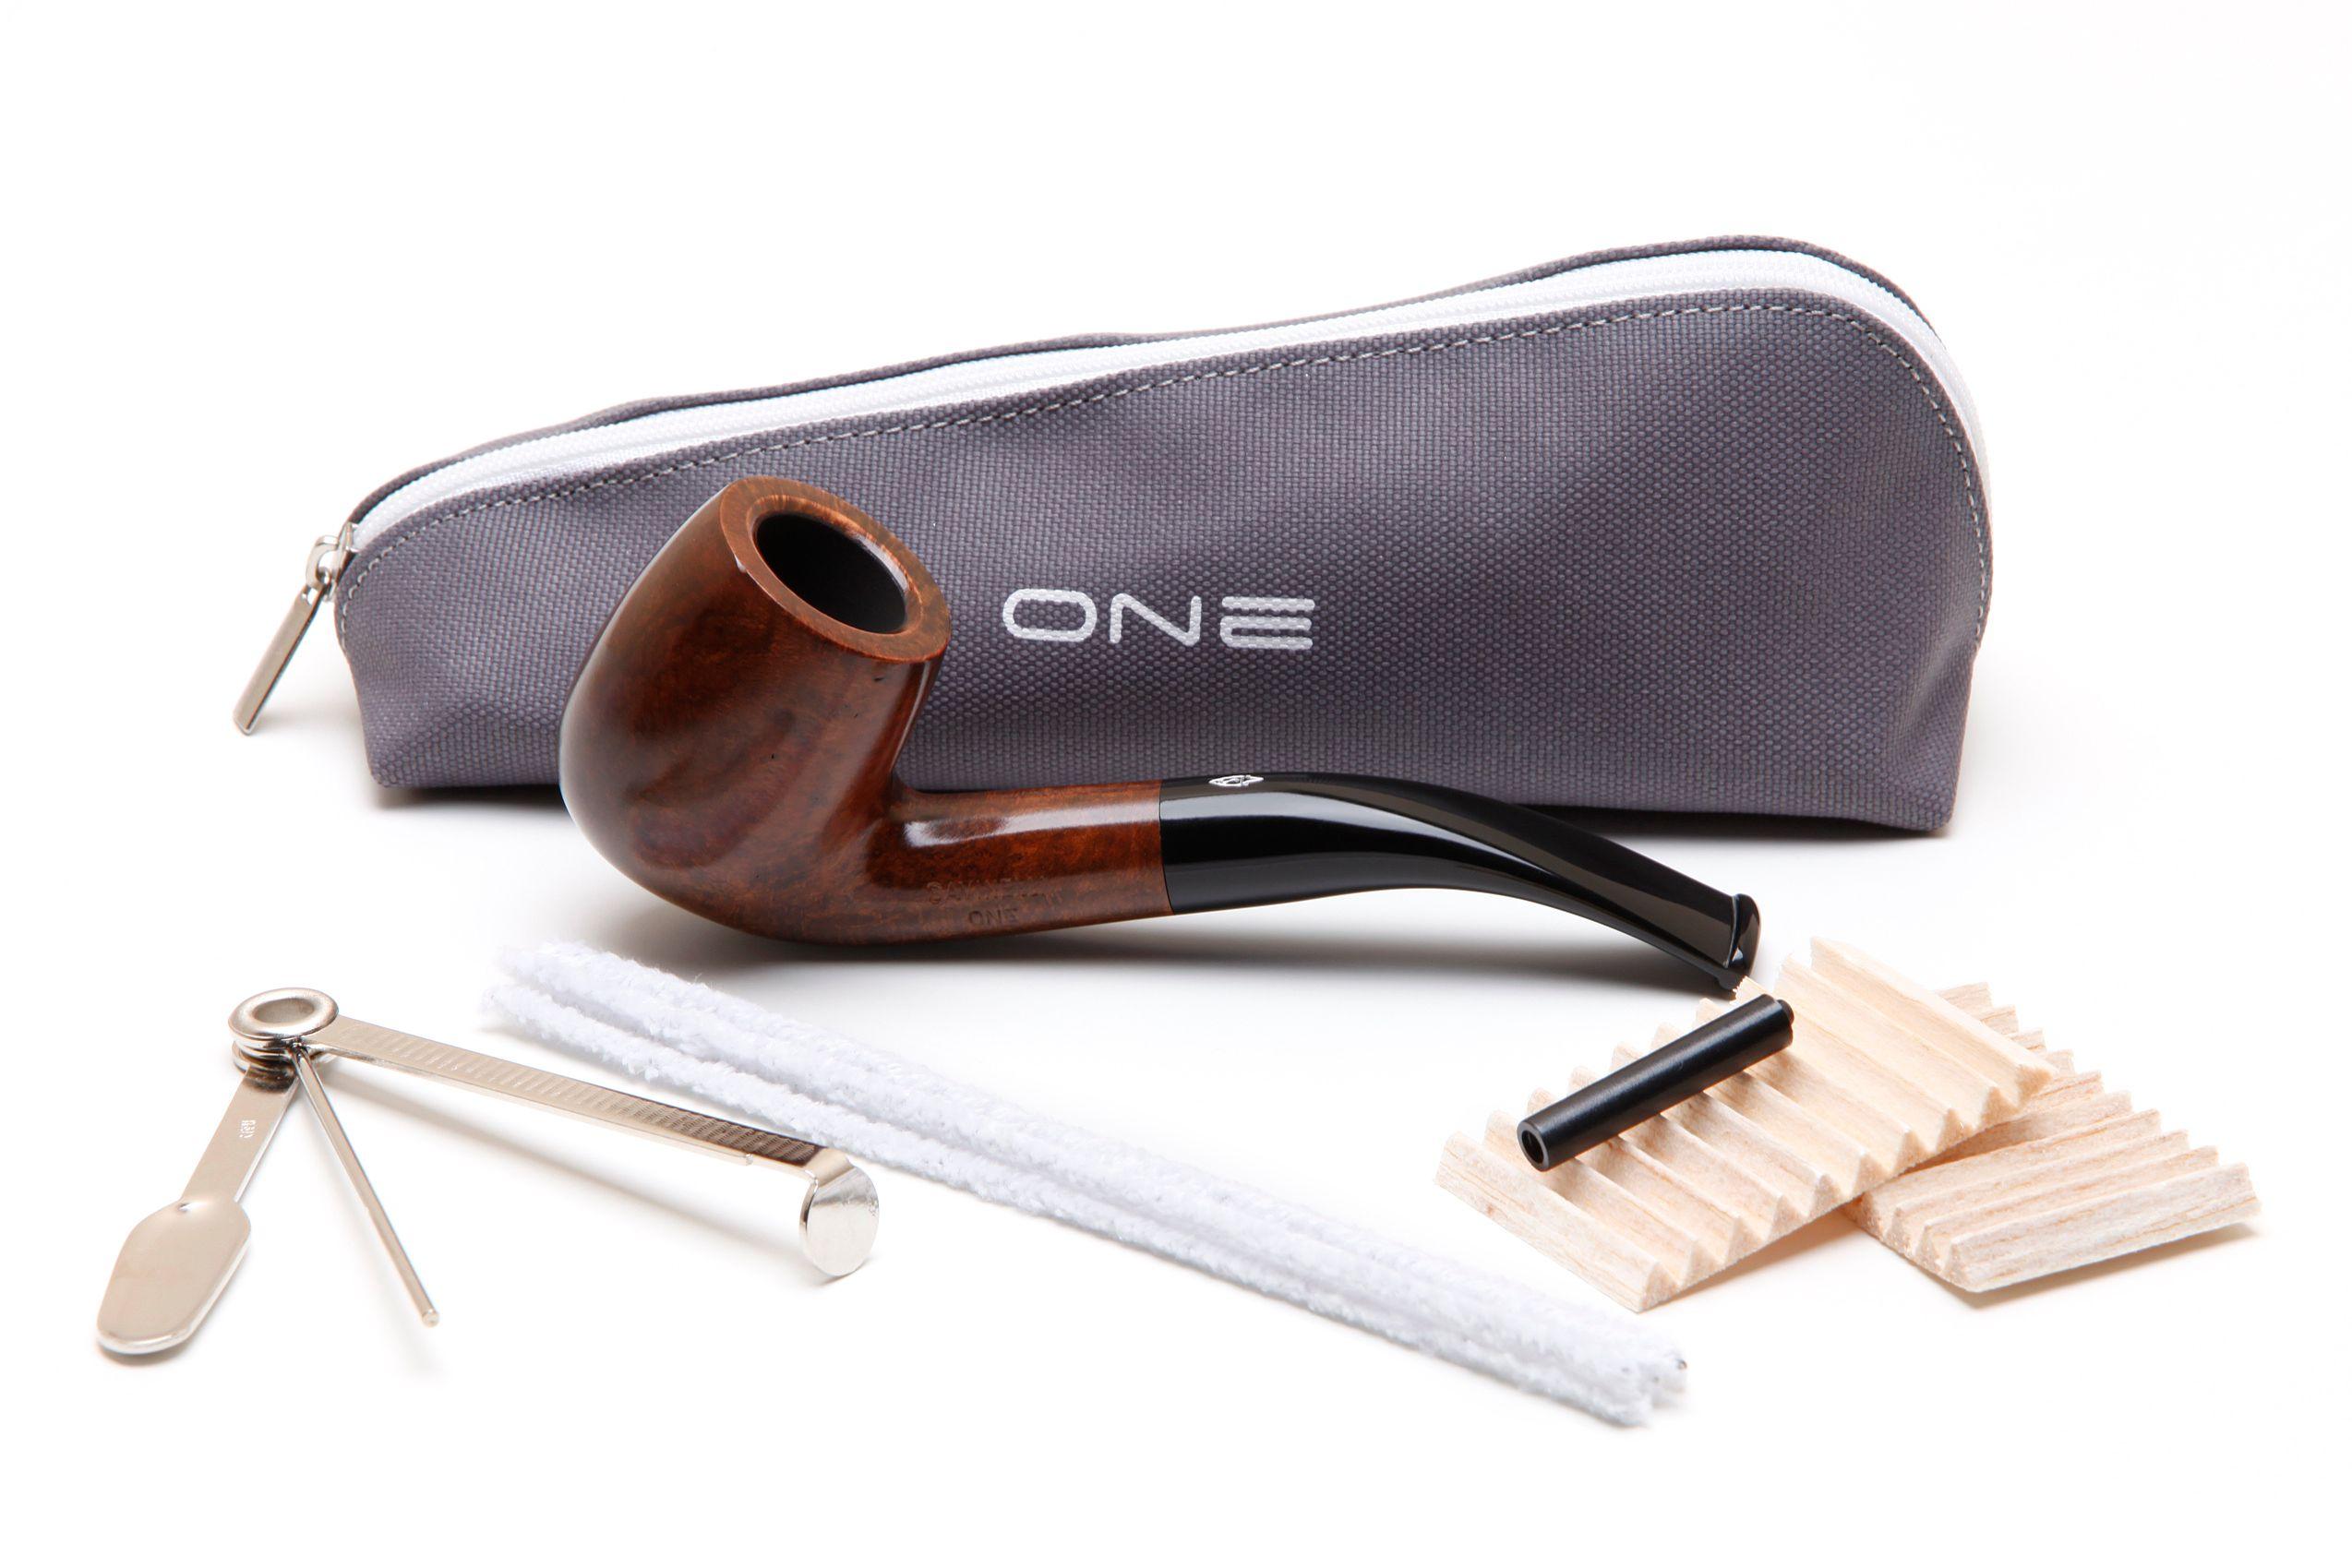 Savinelli One Smooth 601 Tobacco Pipe